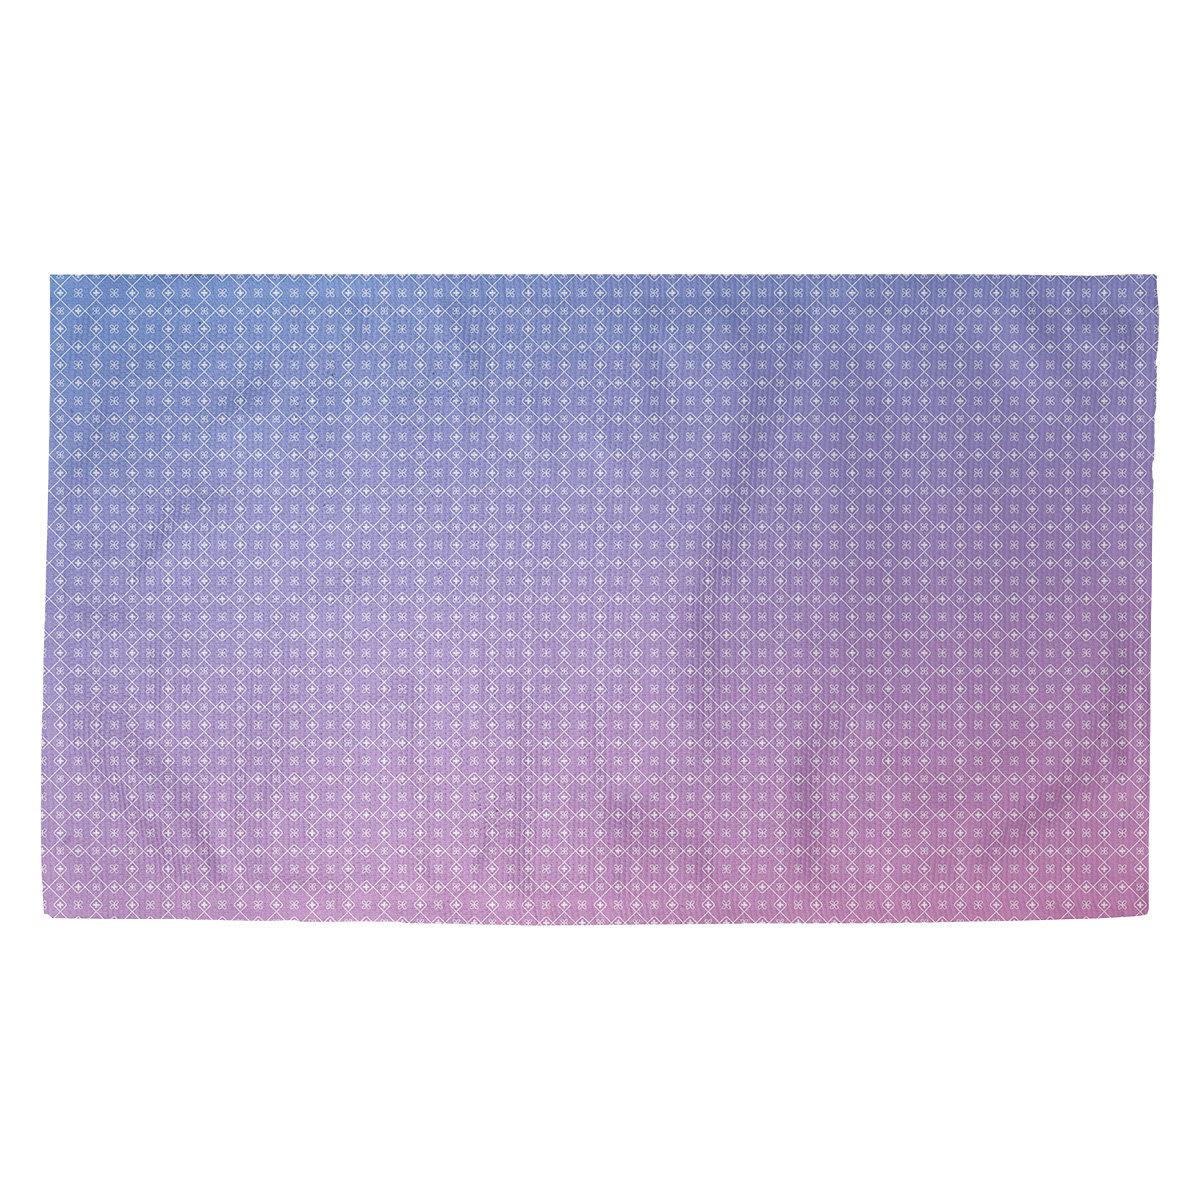 Latitude Run Avicia Doily Blue Pink Area Rug Wayfair